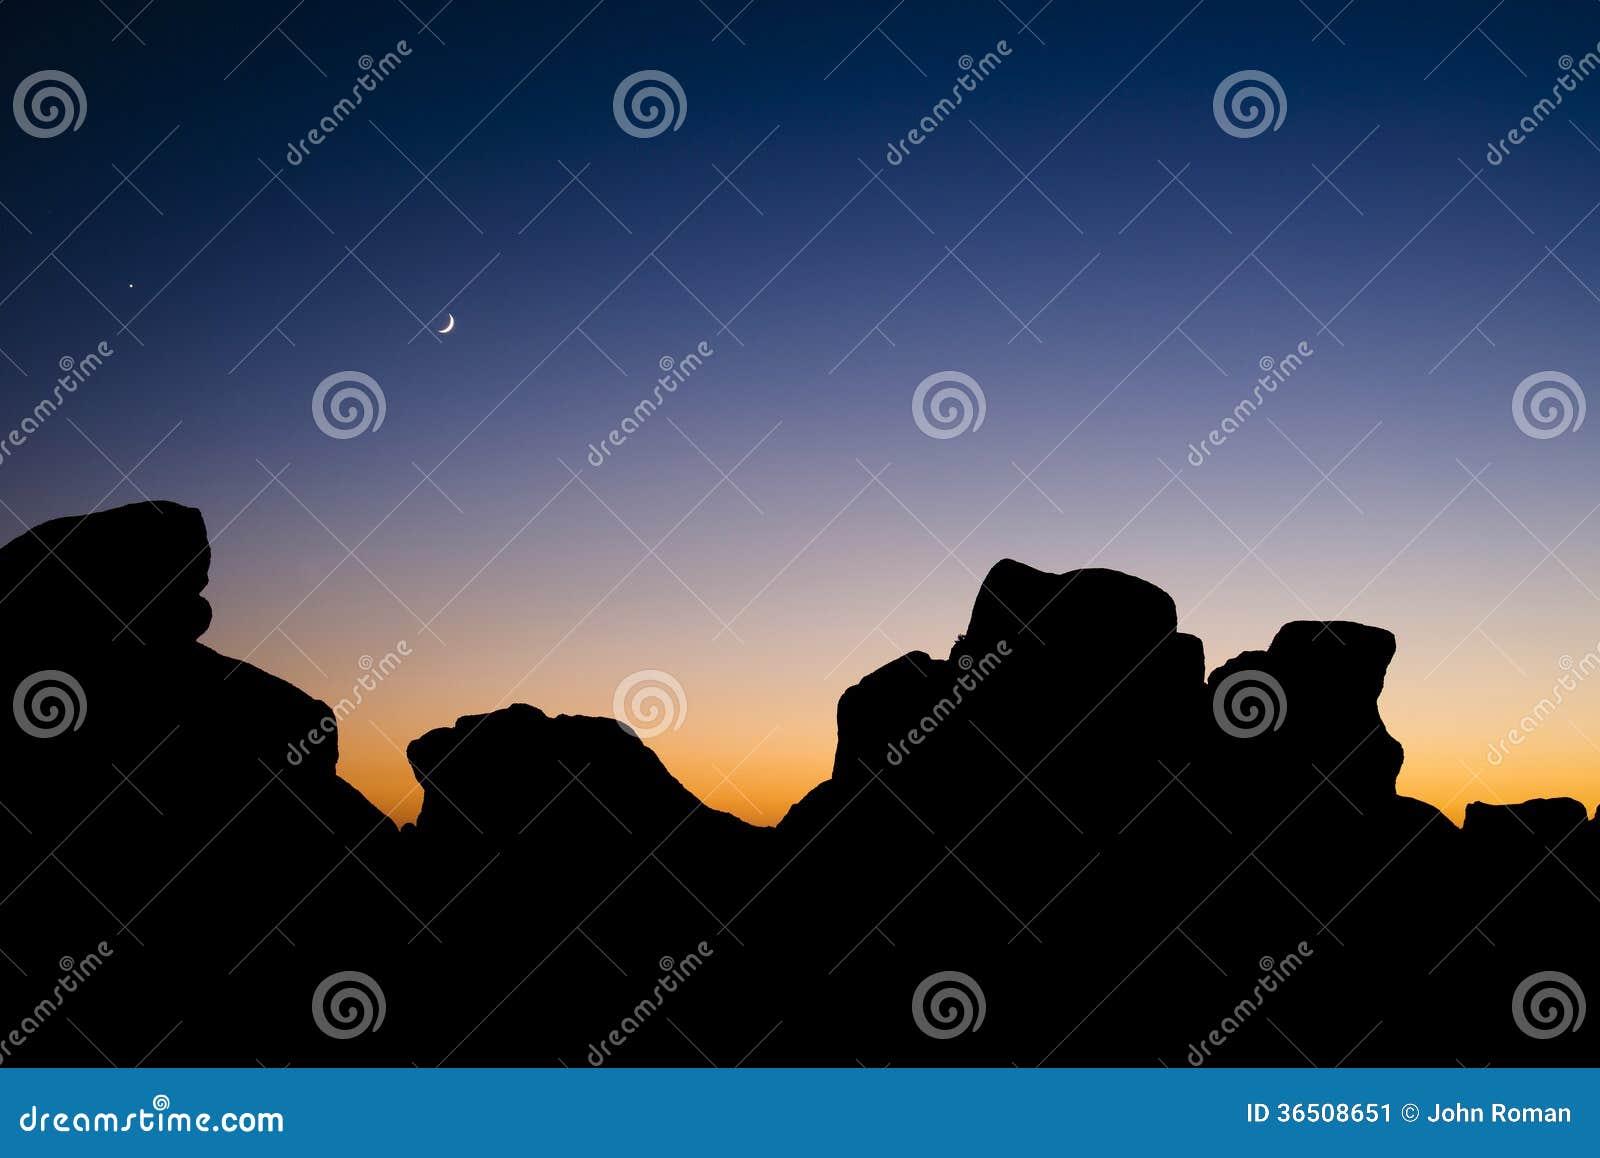 Carmel twilight